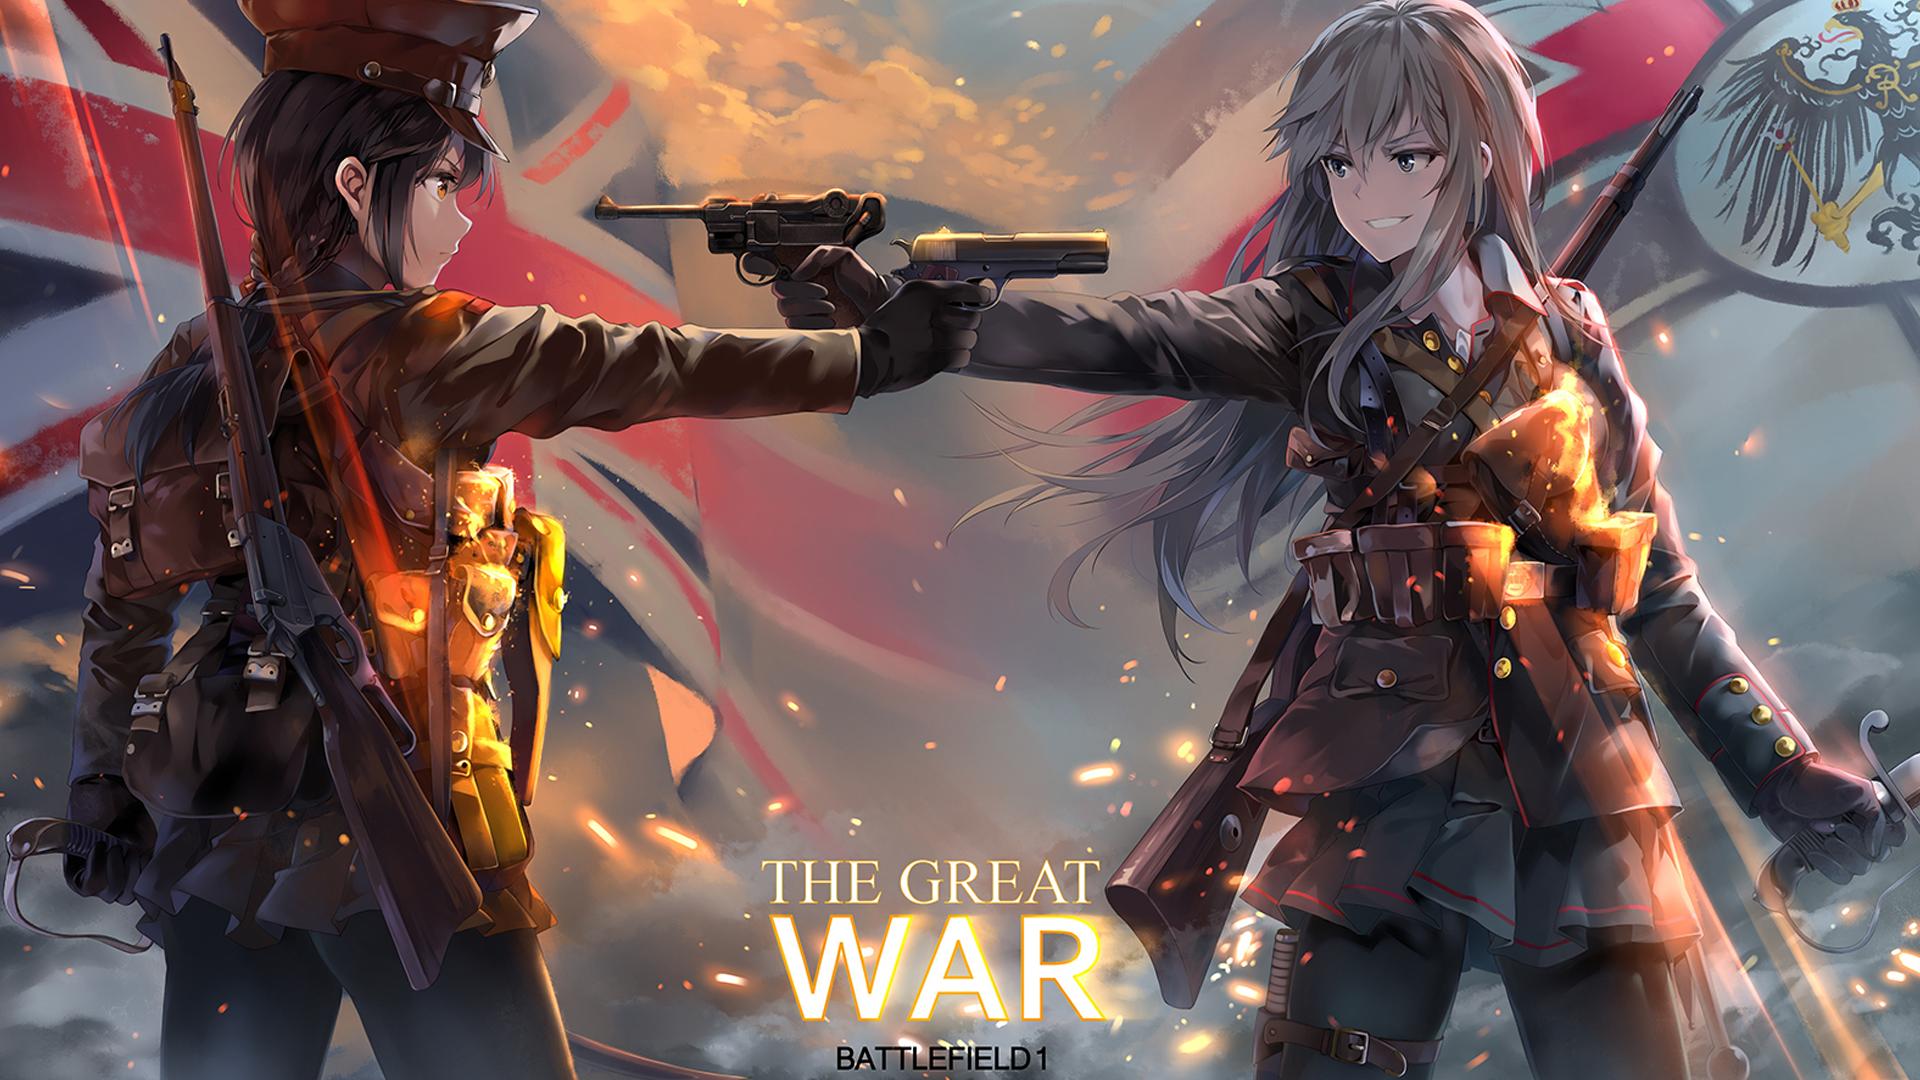 The Great War (1920x1080) HD Wallpaper From Gallsource.com